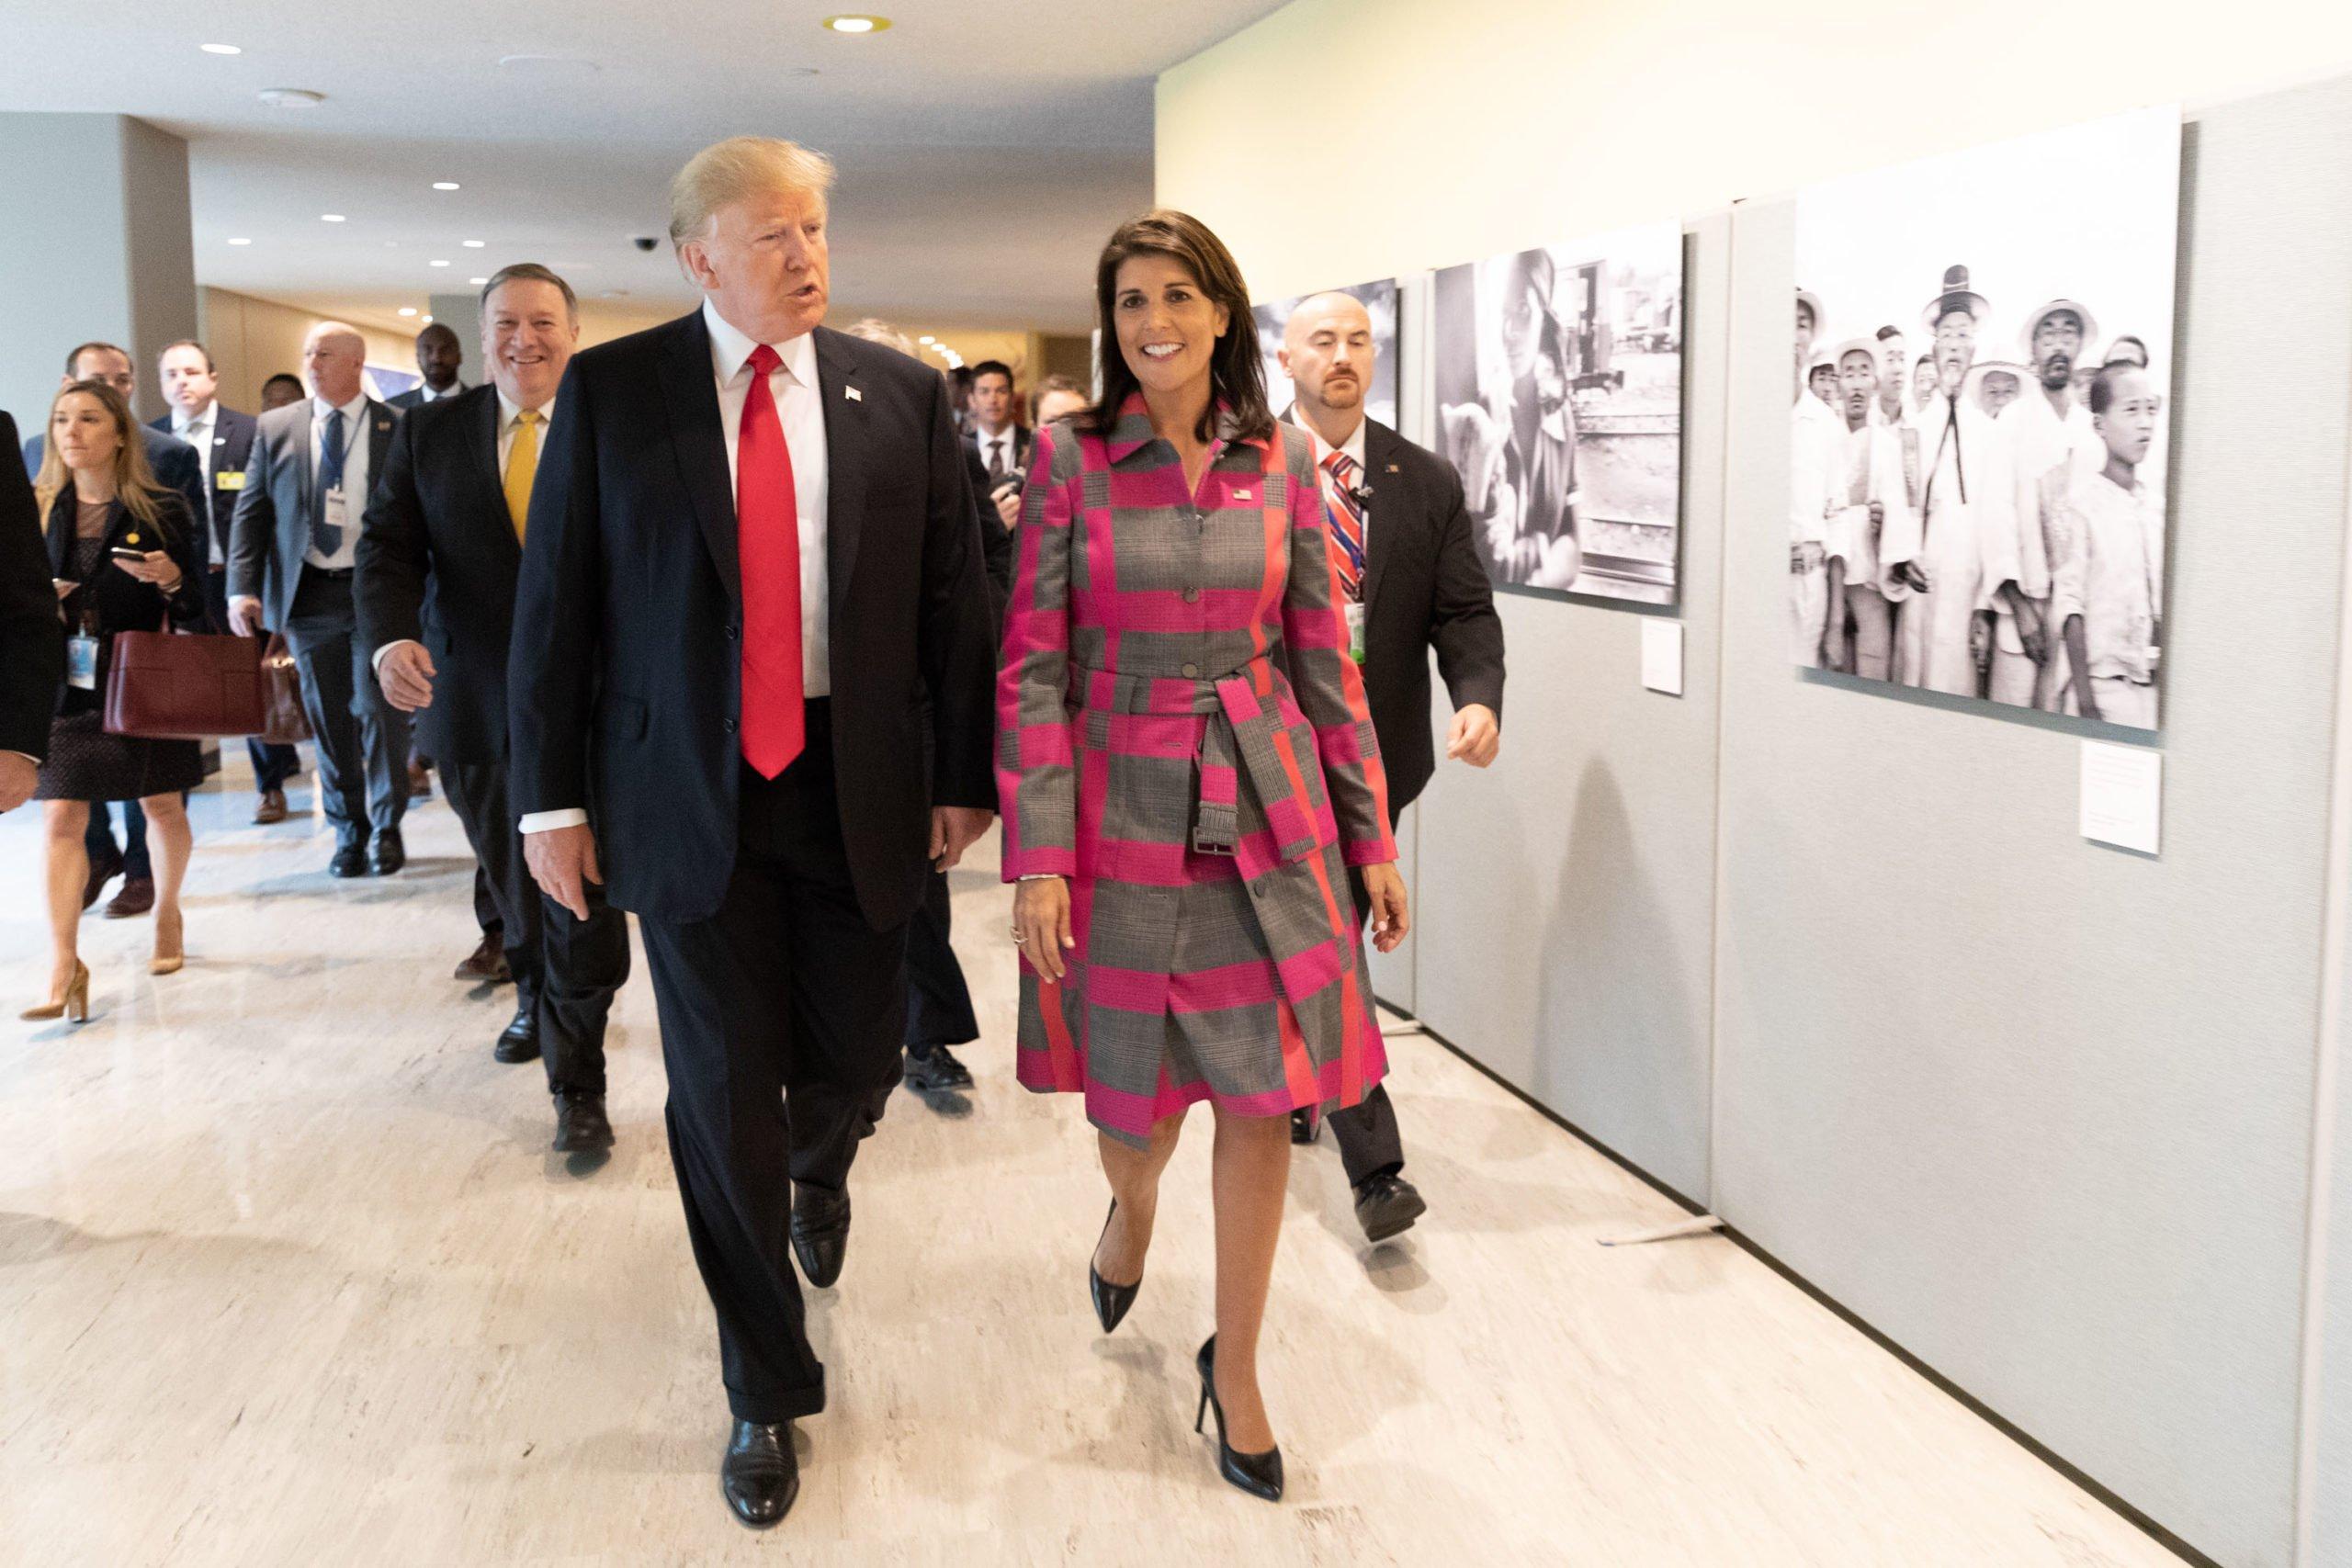 Usa 2020 - Kermesse - Trump - Haley